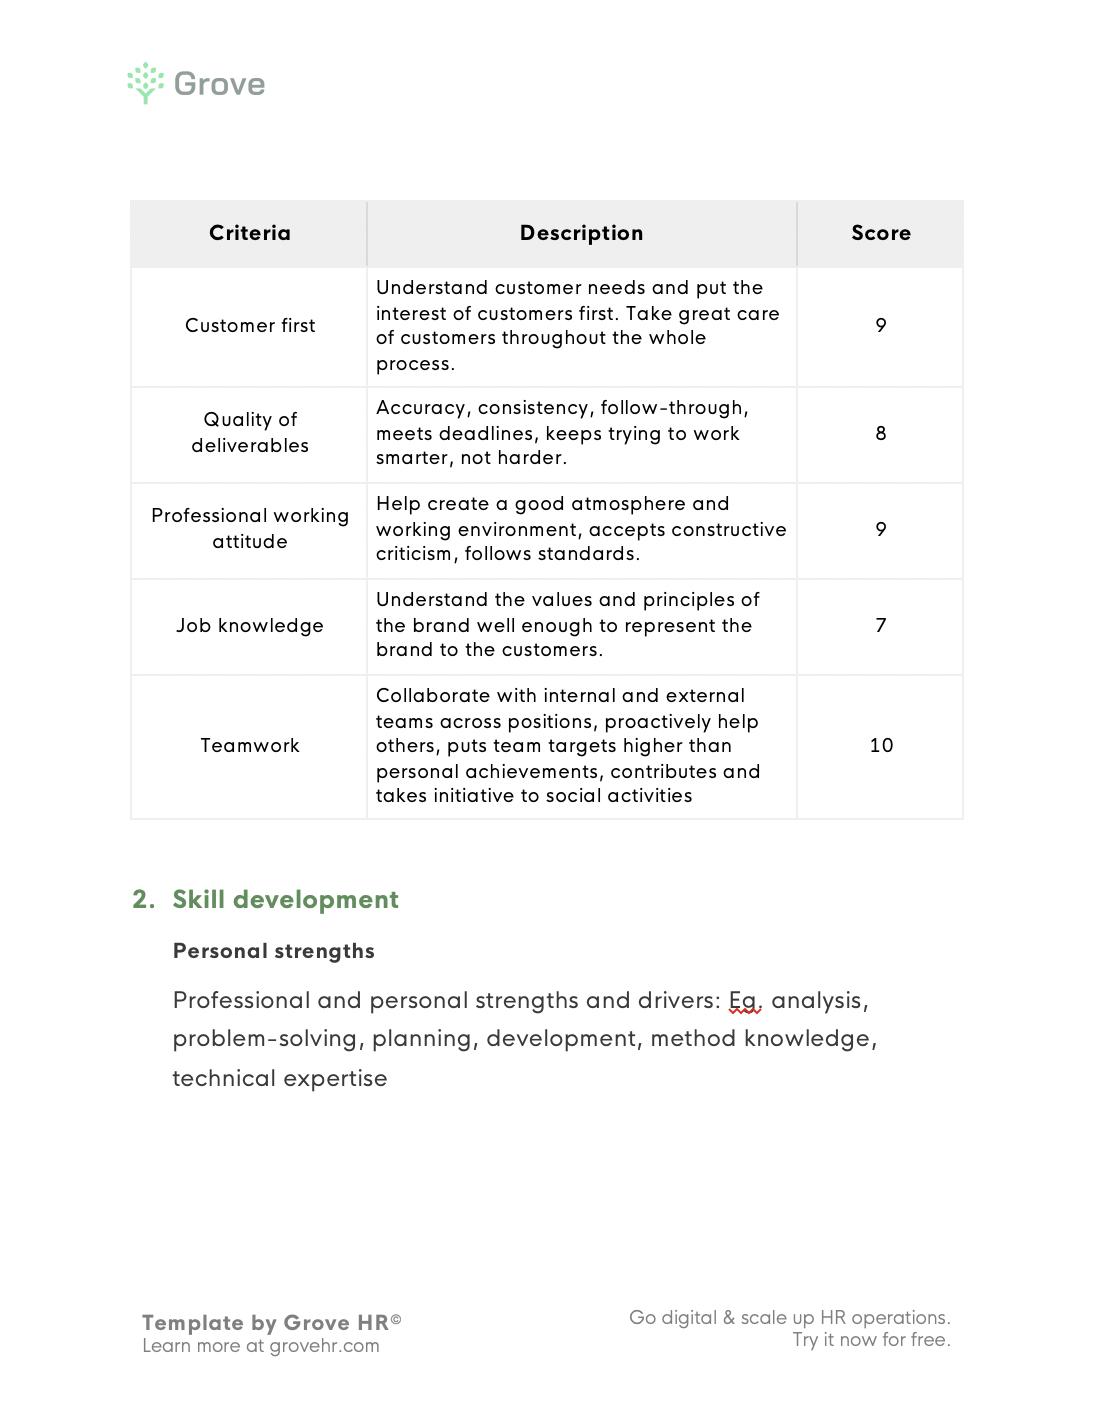 Grove HR - Customer service performance review template slider 3